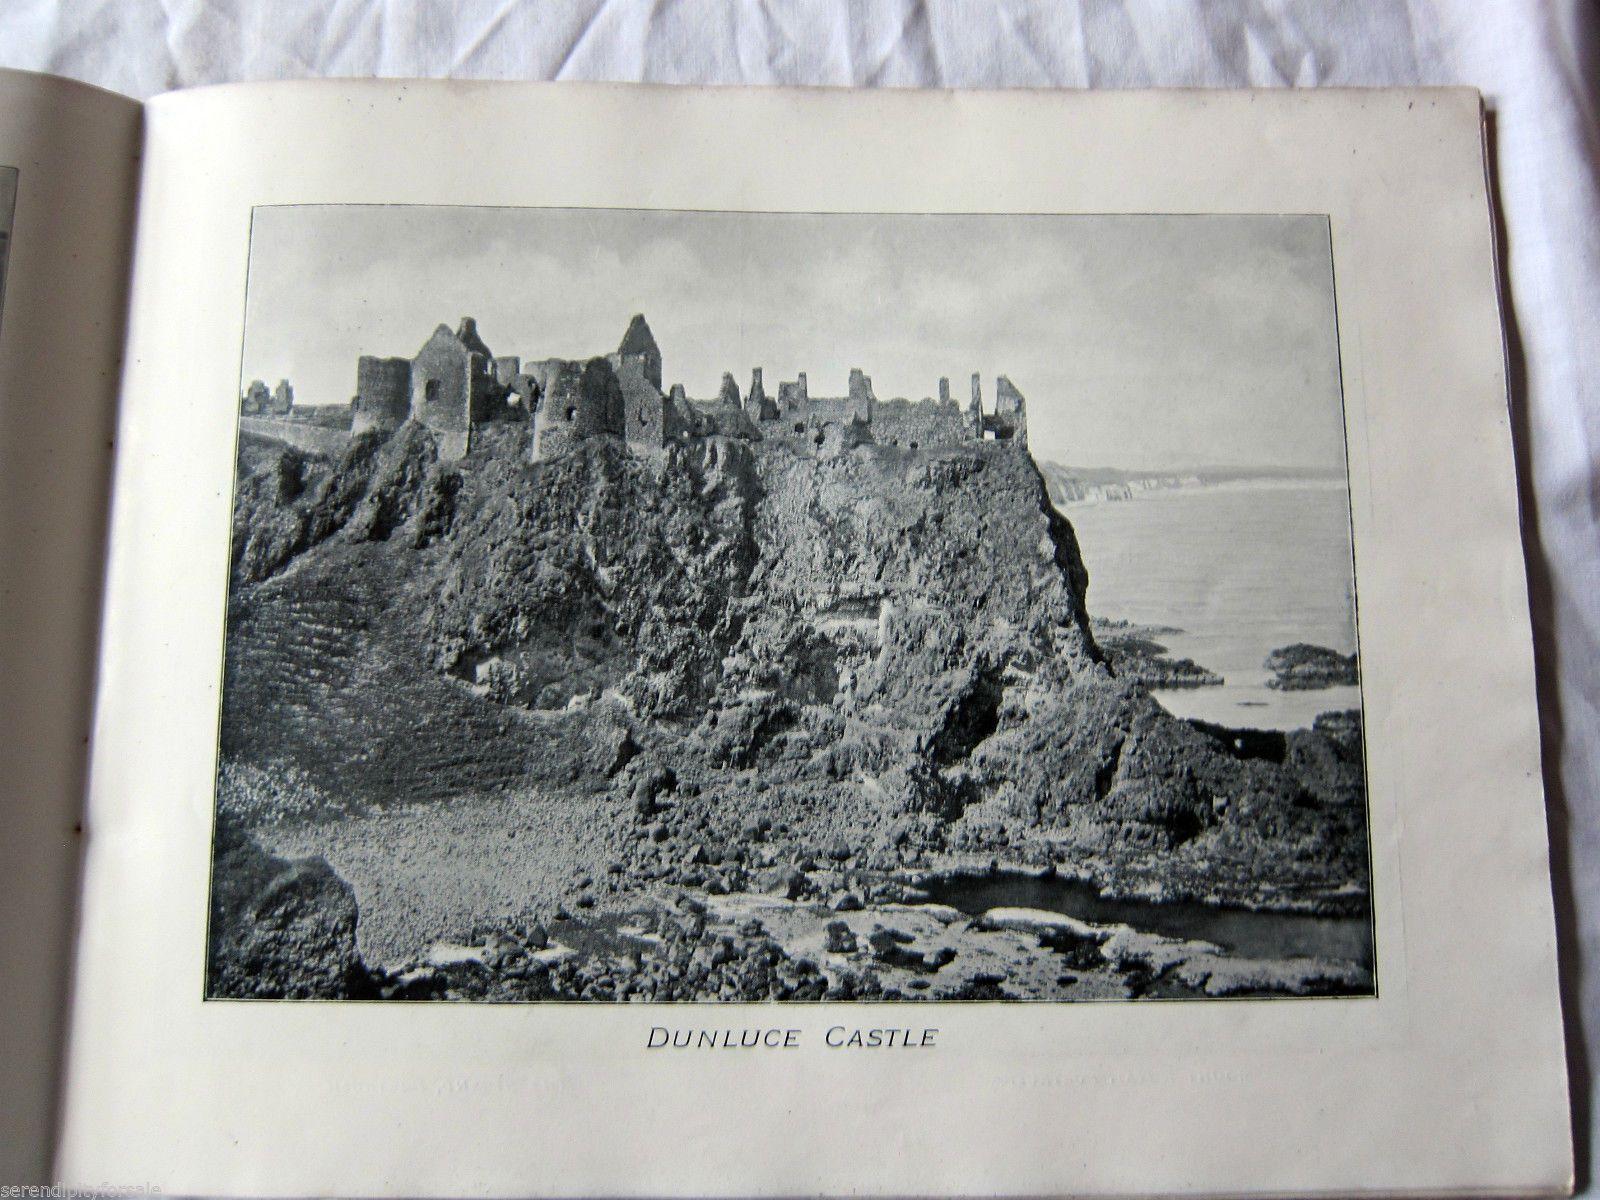 Antique Edwardian The Emerald Isle Album Giant's Causeway Antrim Coast CA 1902   eBay